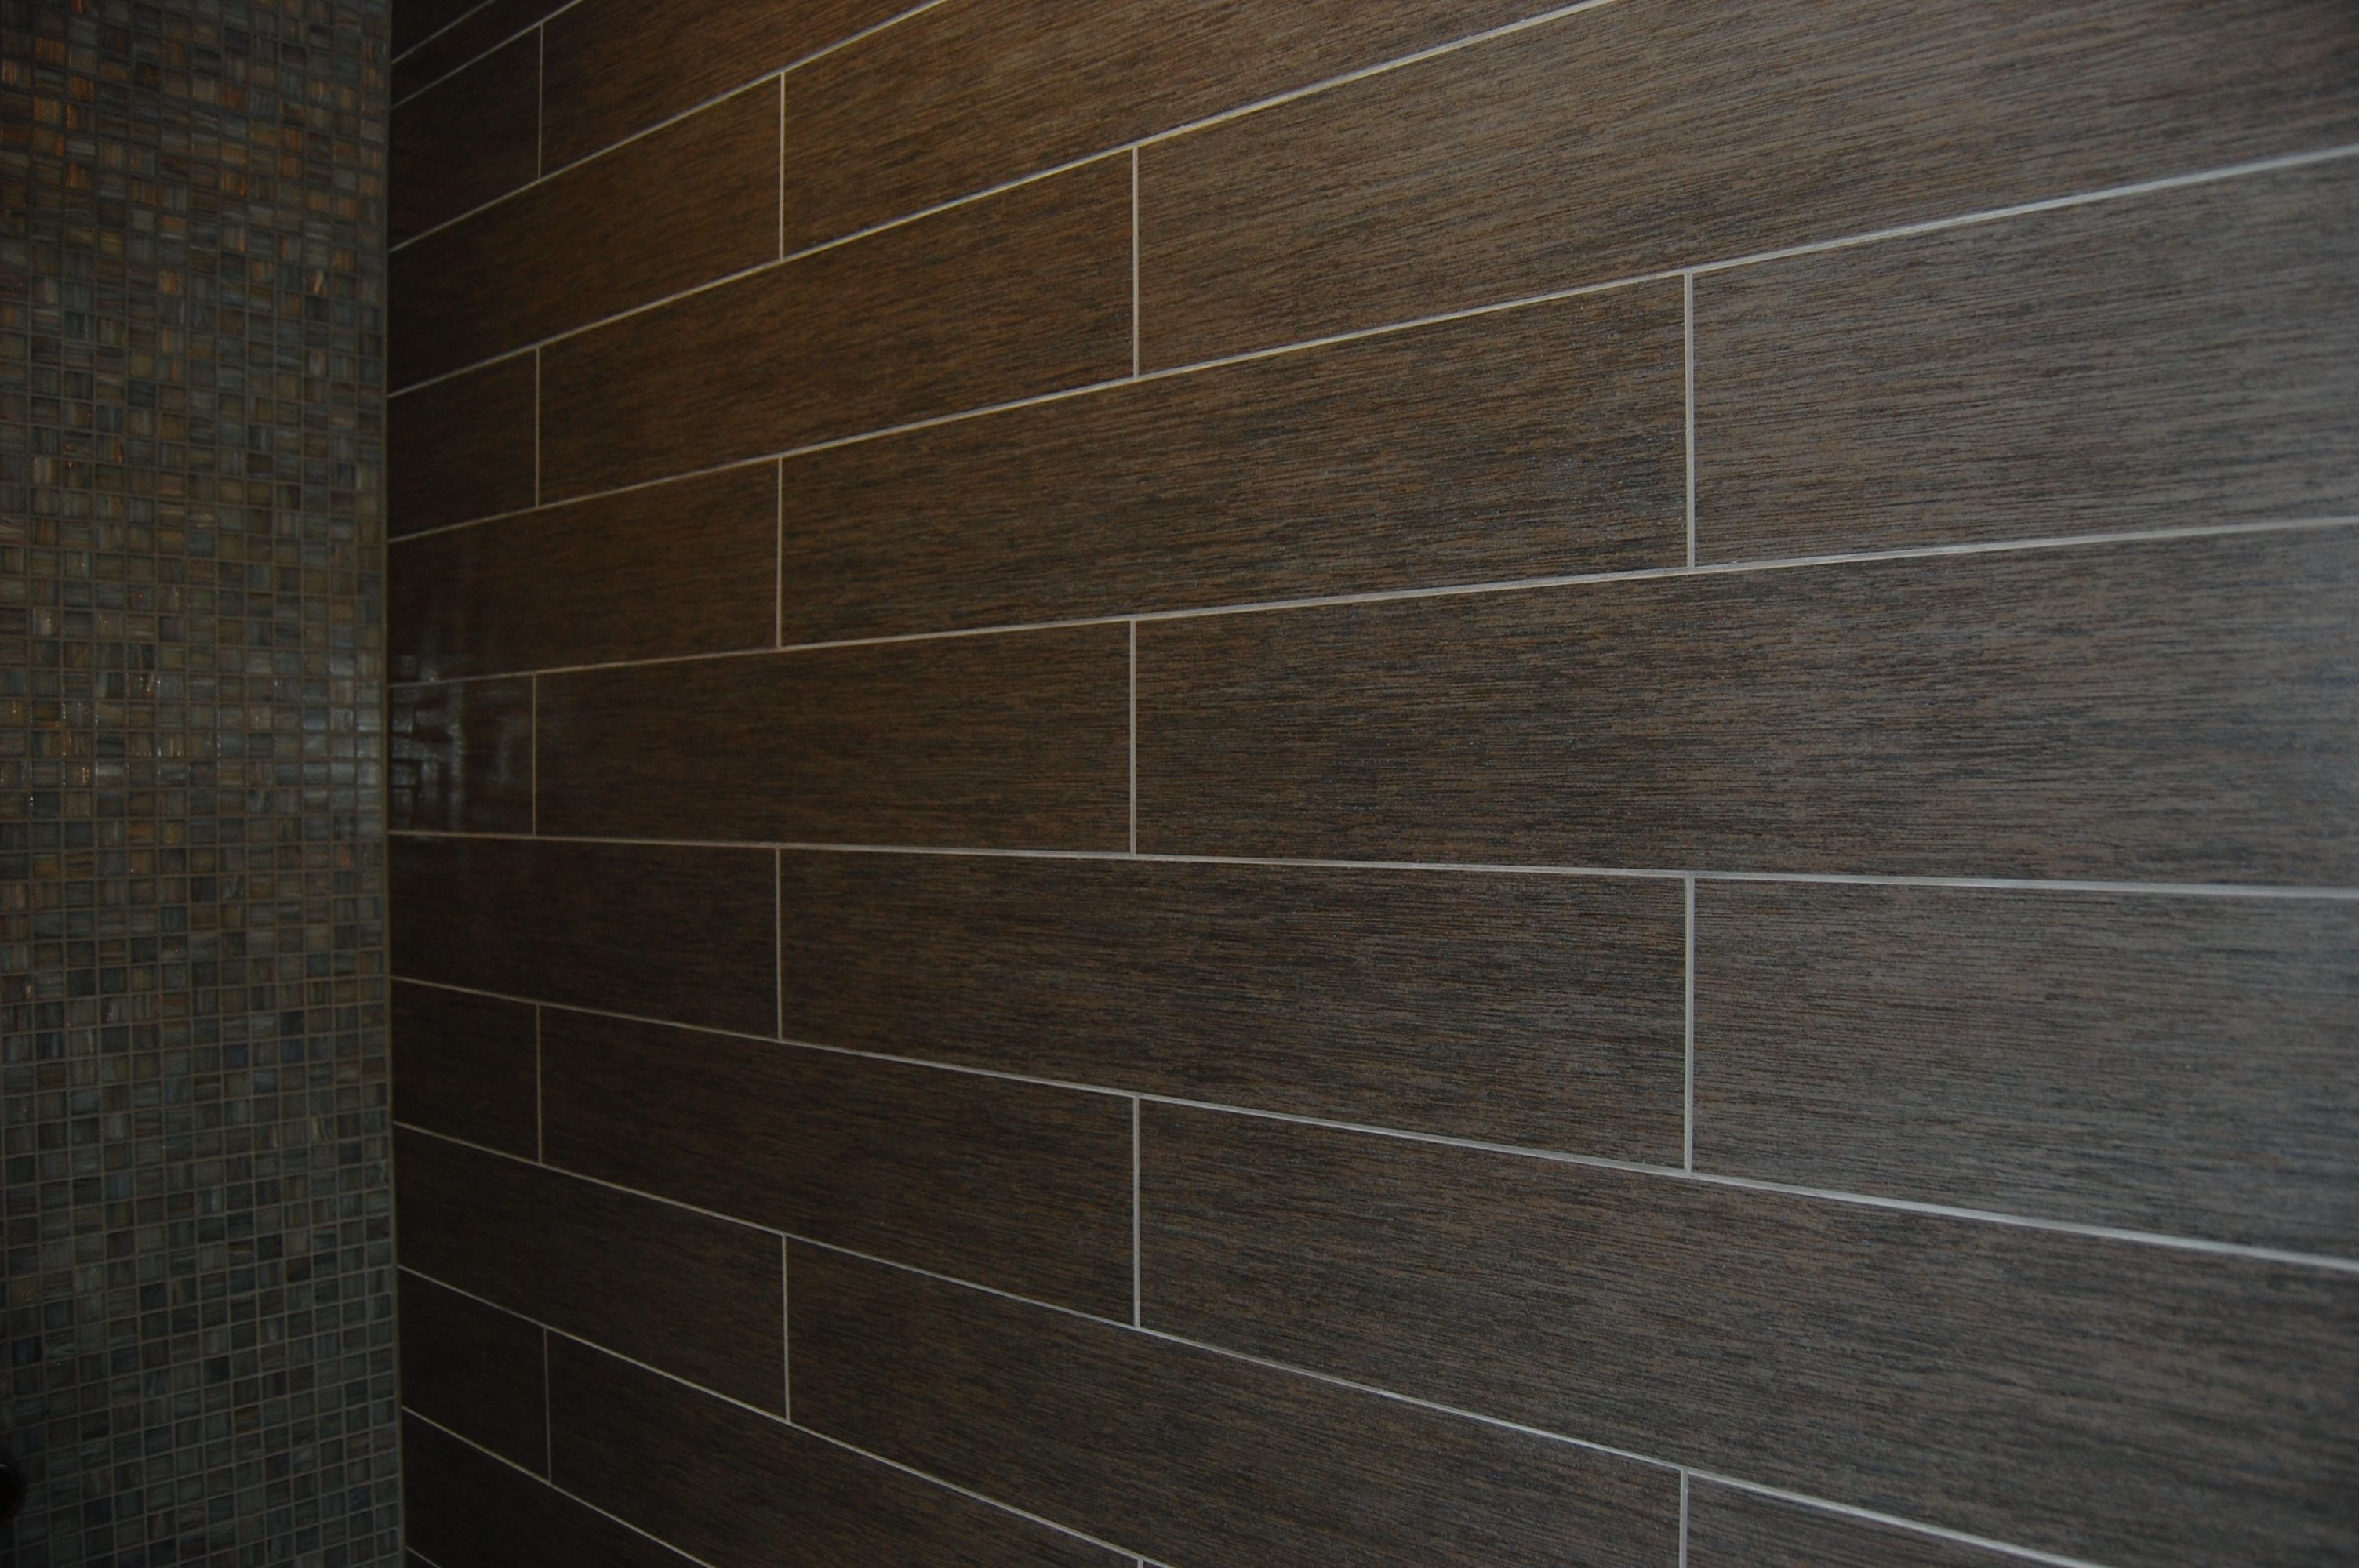 Commercial Bathroom Tile Ideas Wall Detail Porcelain Tile